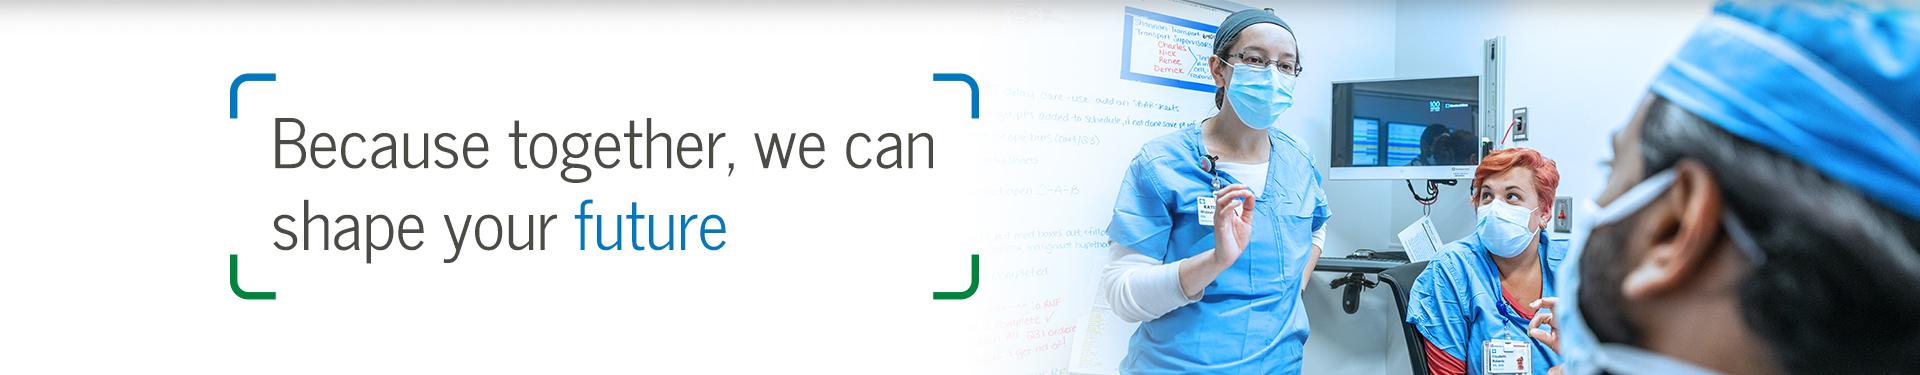 Caregiver Development Desktop Image